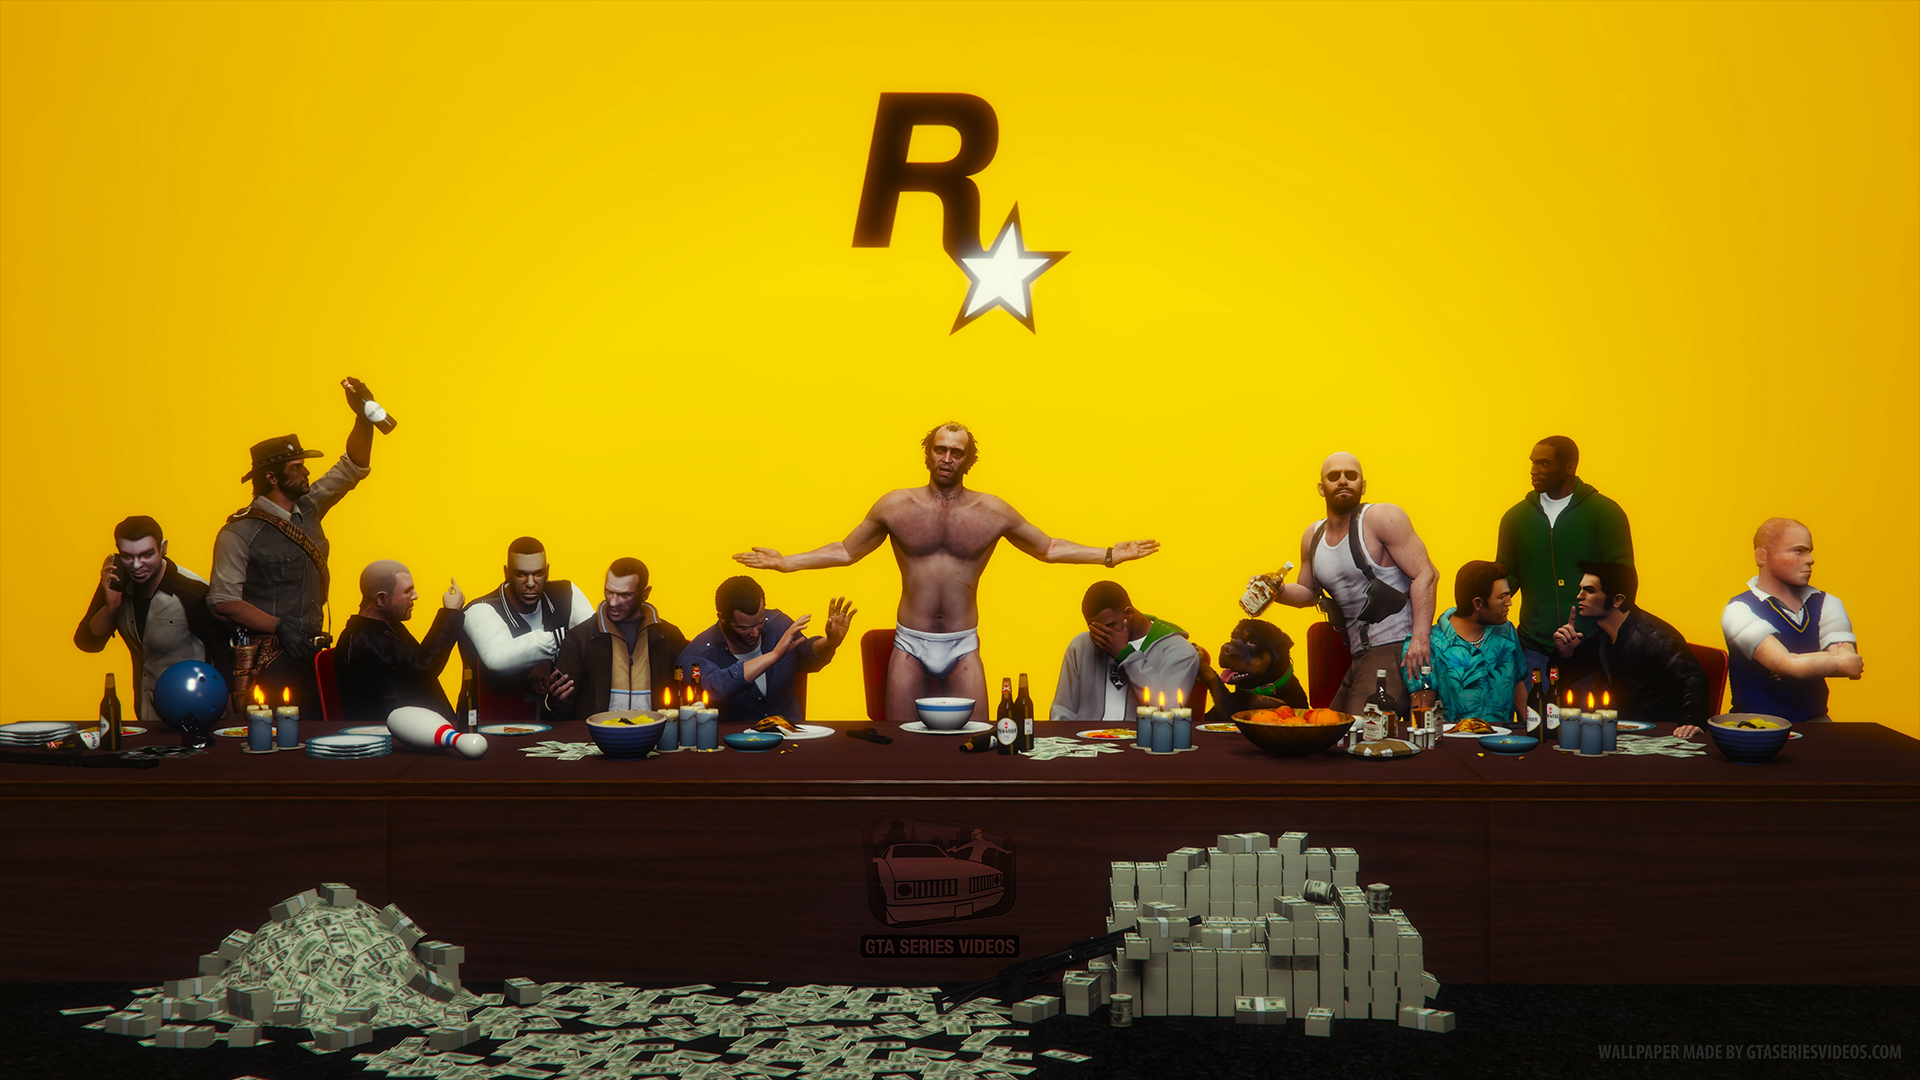 Gta 5 rockstar games mannequin challenge youtube - Last supper 4k ...